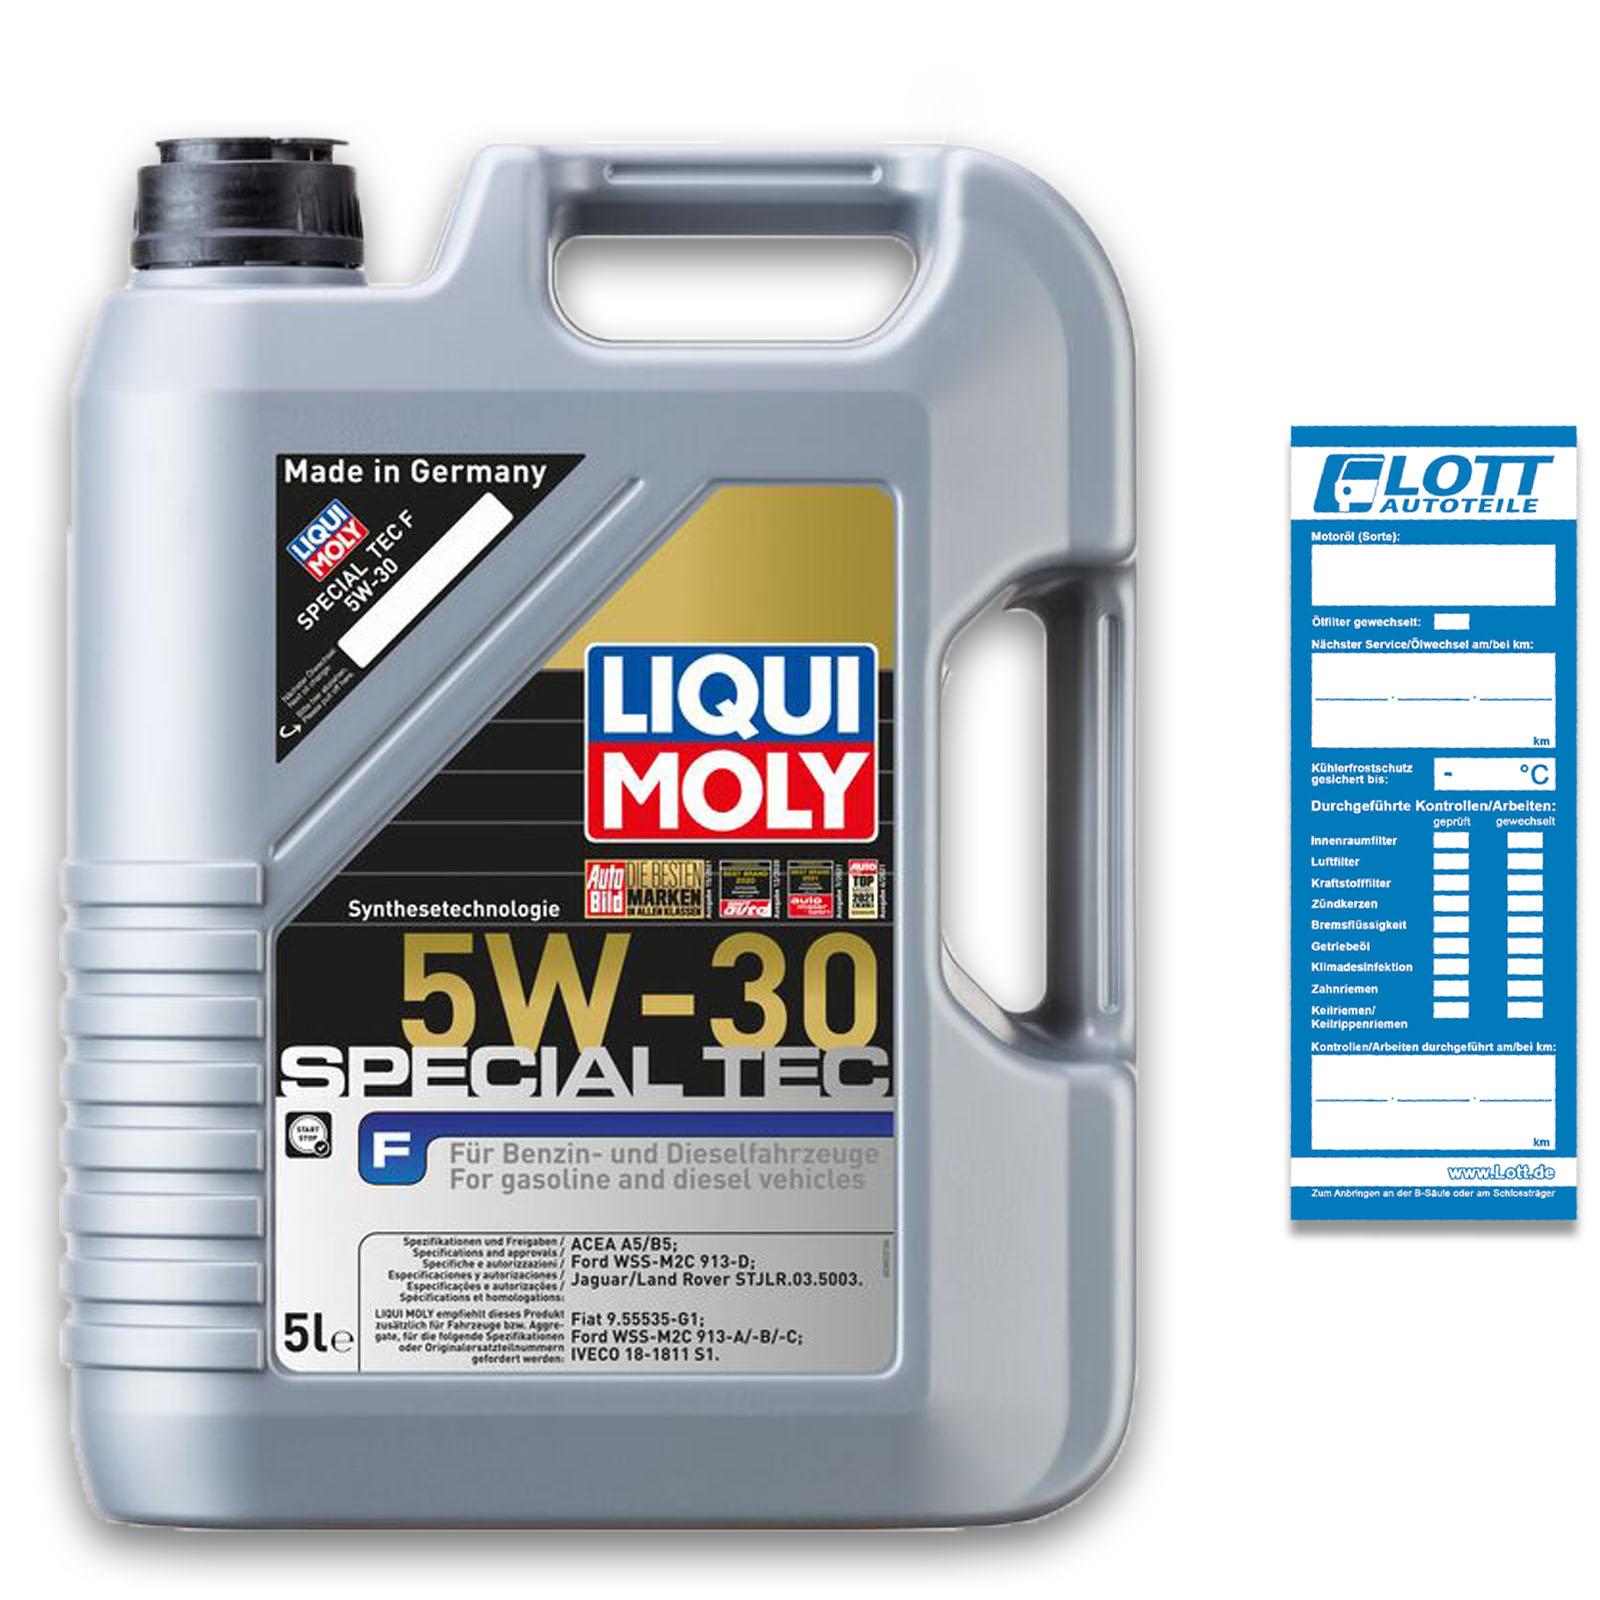 Liqui Moly Leichtlaufmotorenöl Special Tec F 5W-30 5L